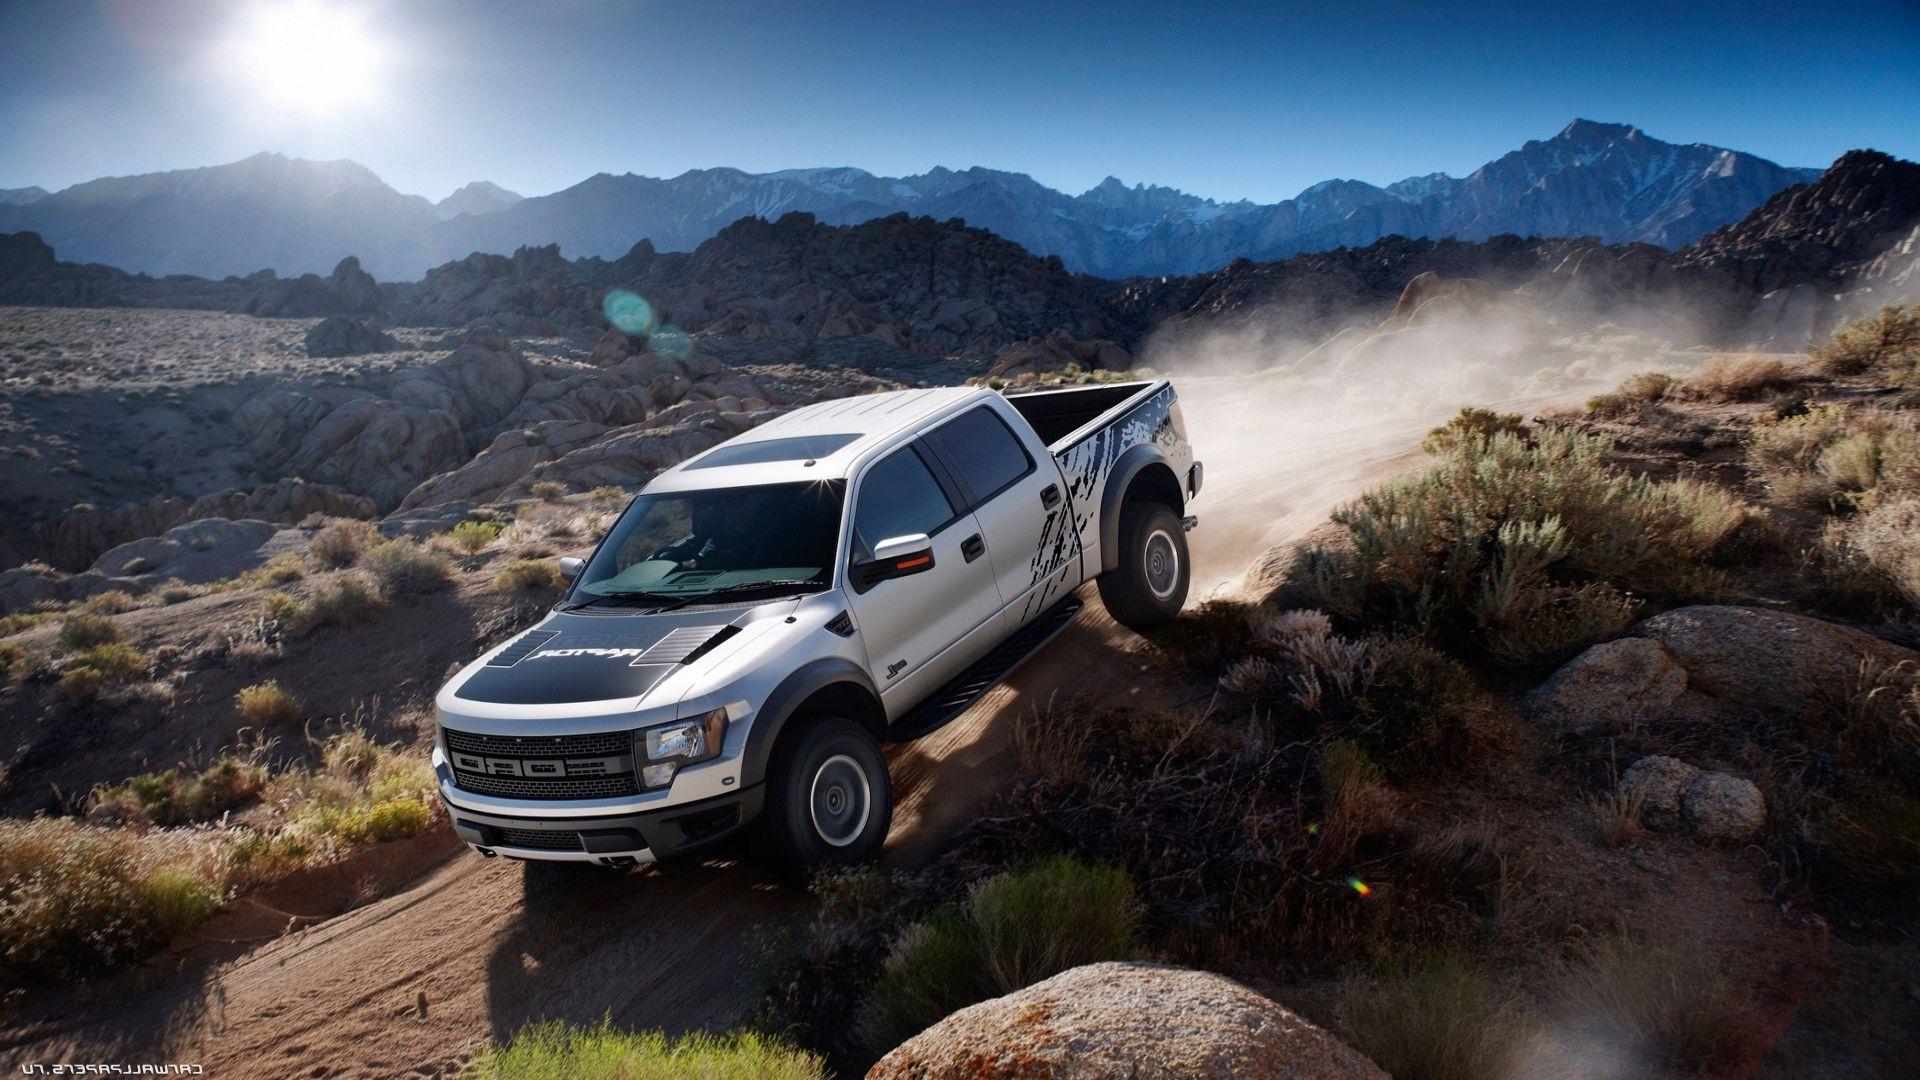 Hd Tune Up Cars Wallpaper Ford Raptor Hd Wallpapers Pixelstalk Net